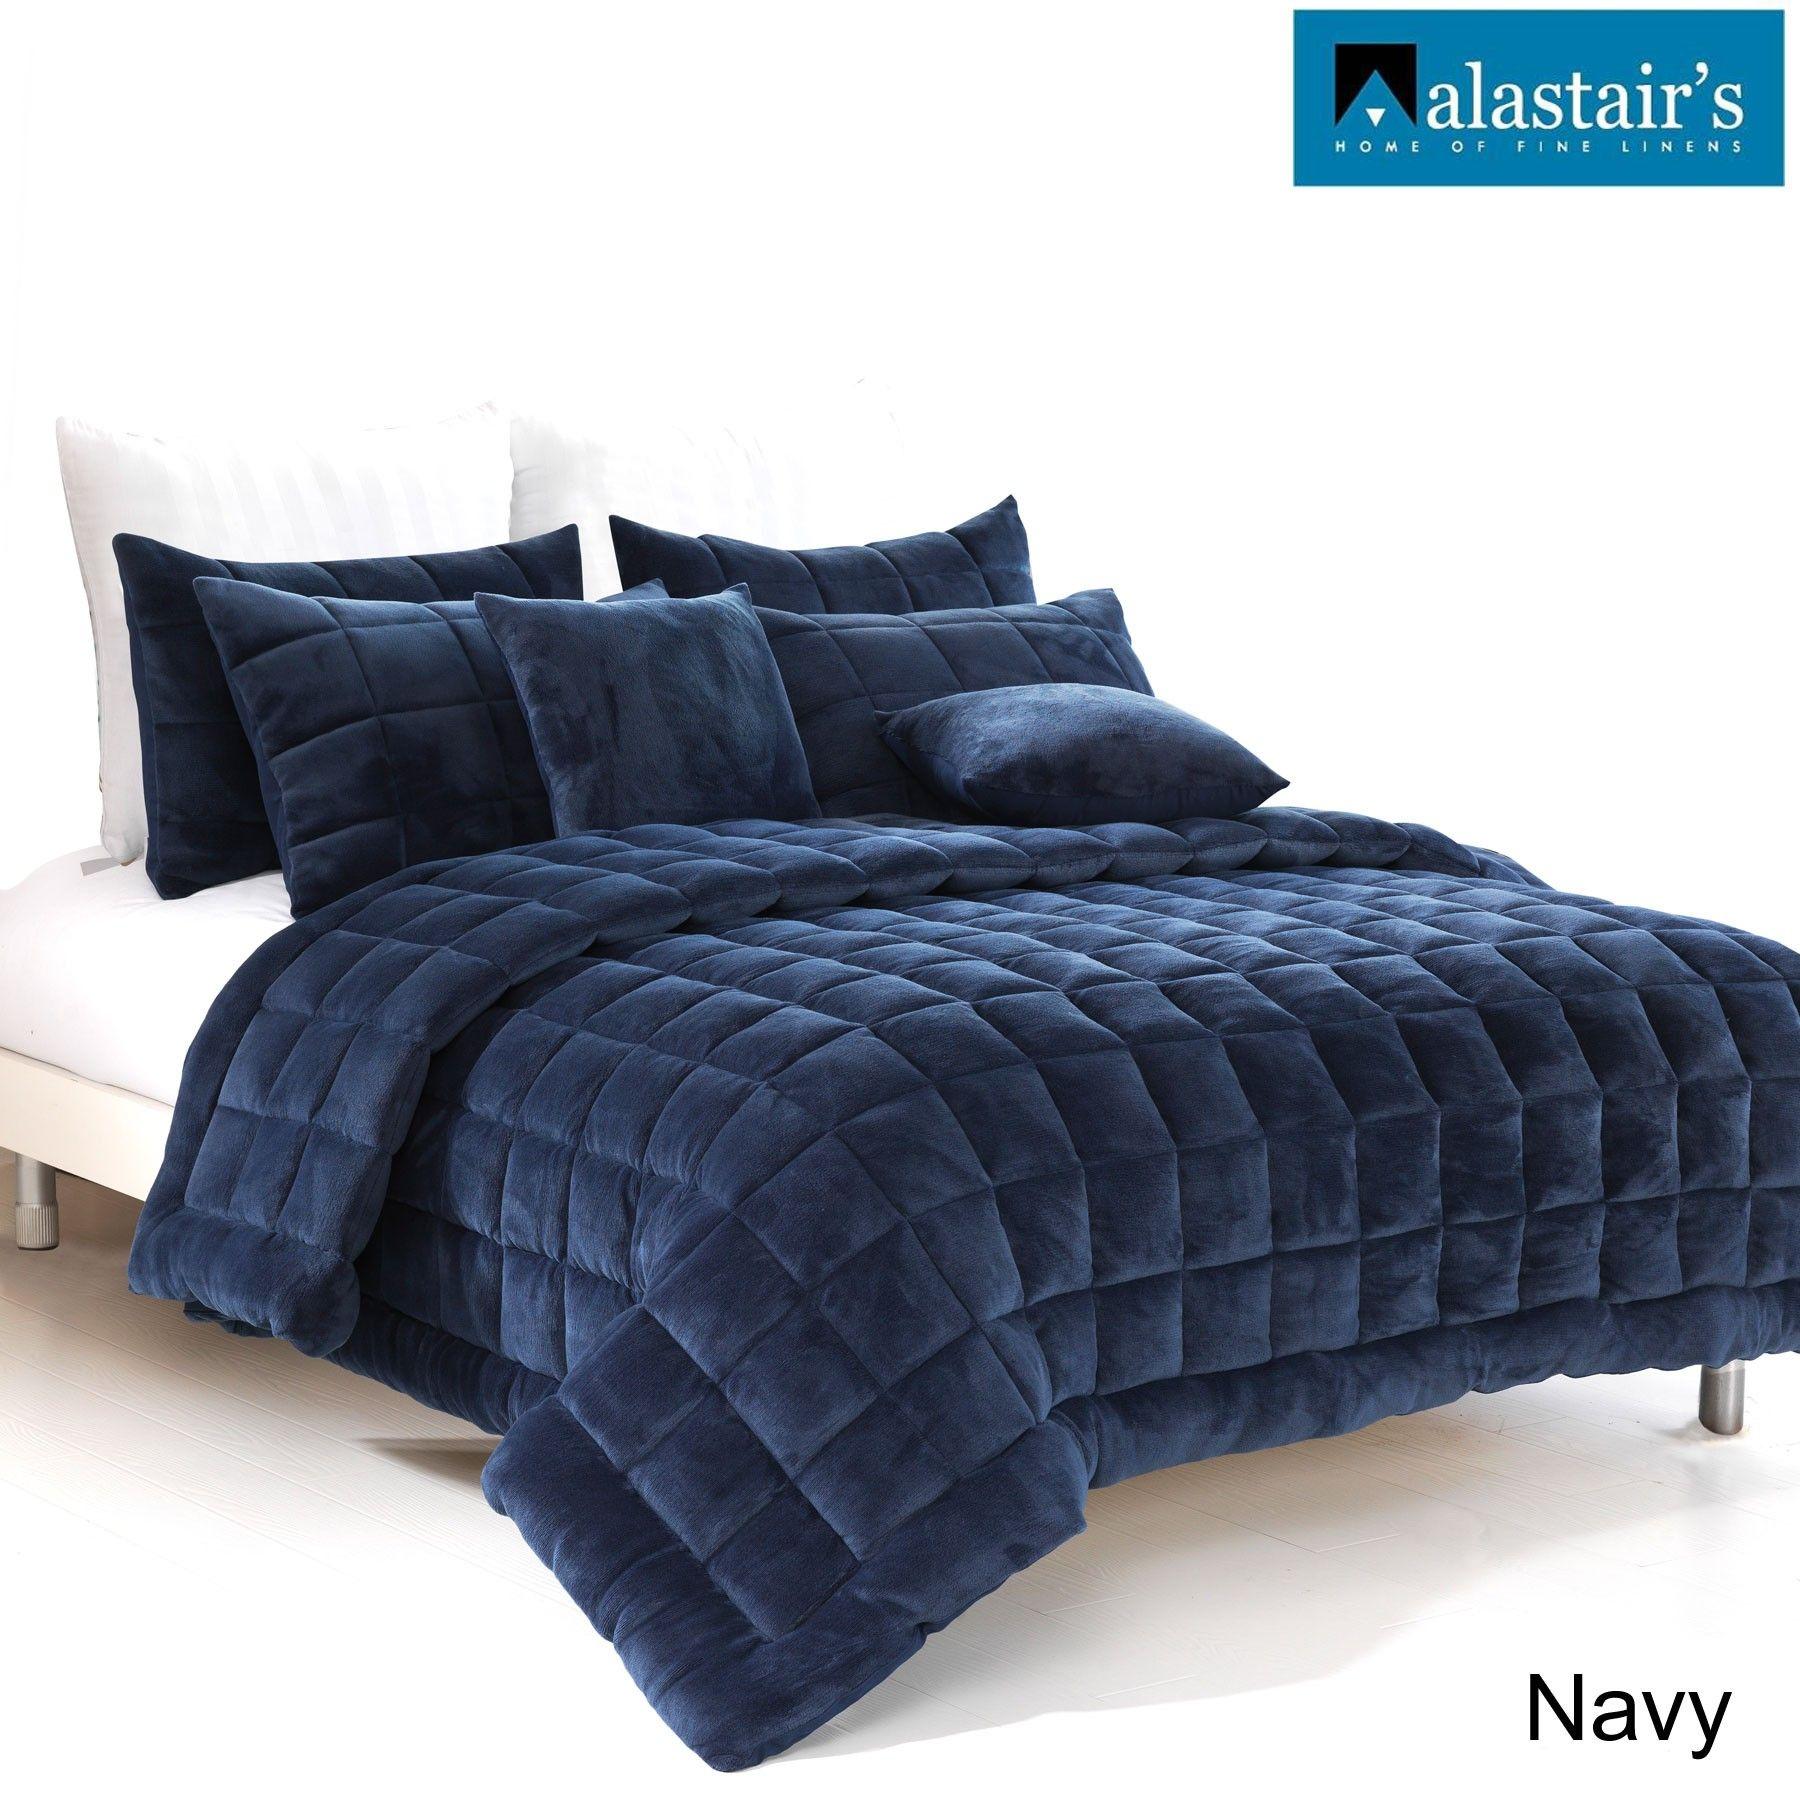 Augusta Velvet Quilt/Bedding Set Navy by Alastairs Quilt